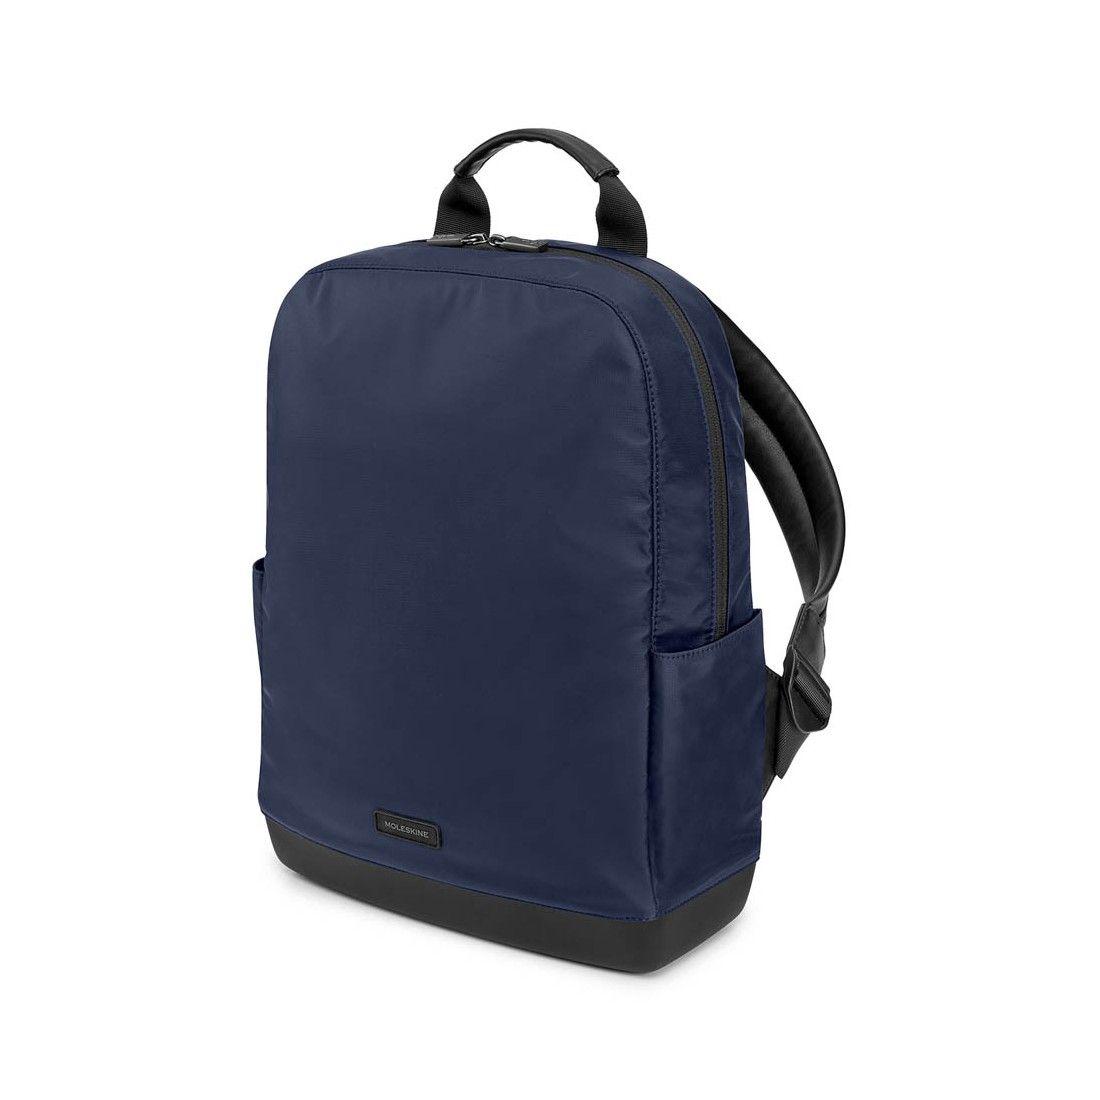 Mochila The Backpack - Nylon Ripstop - Moleskine - 1